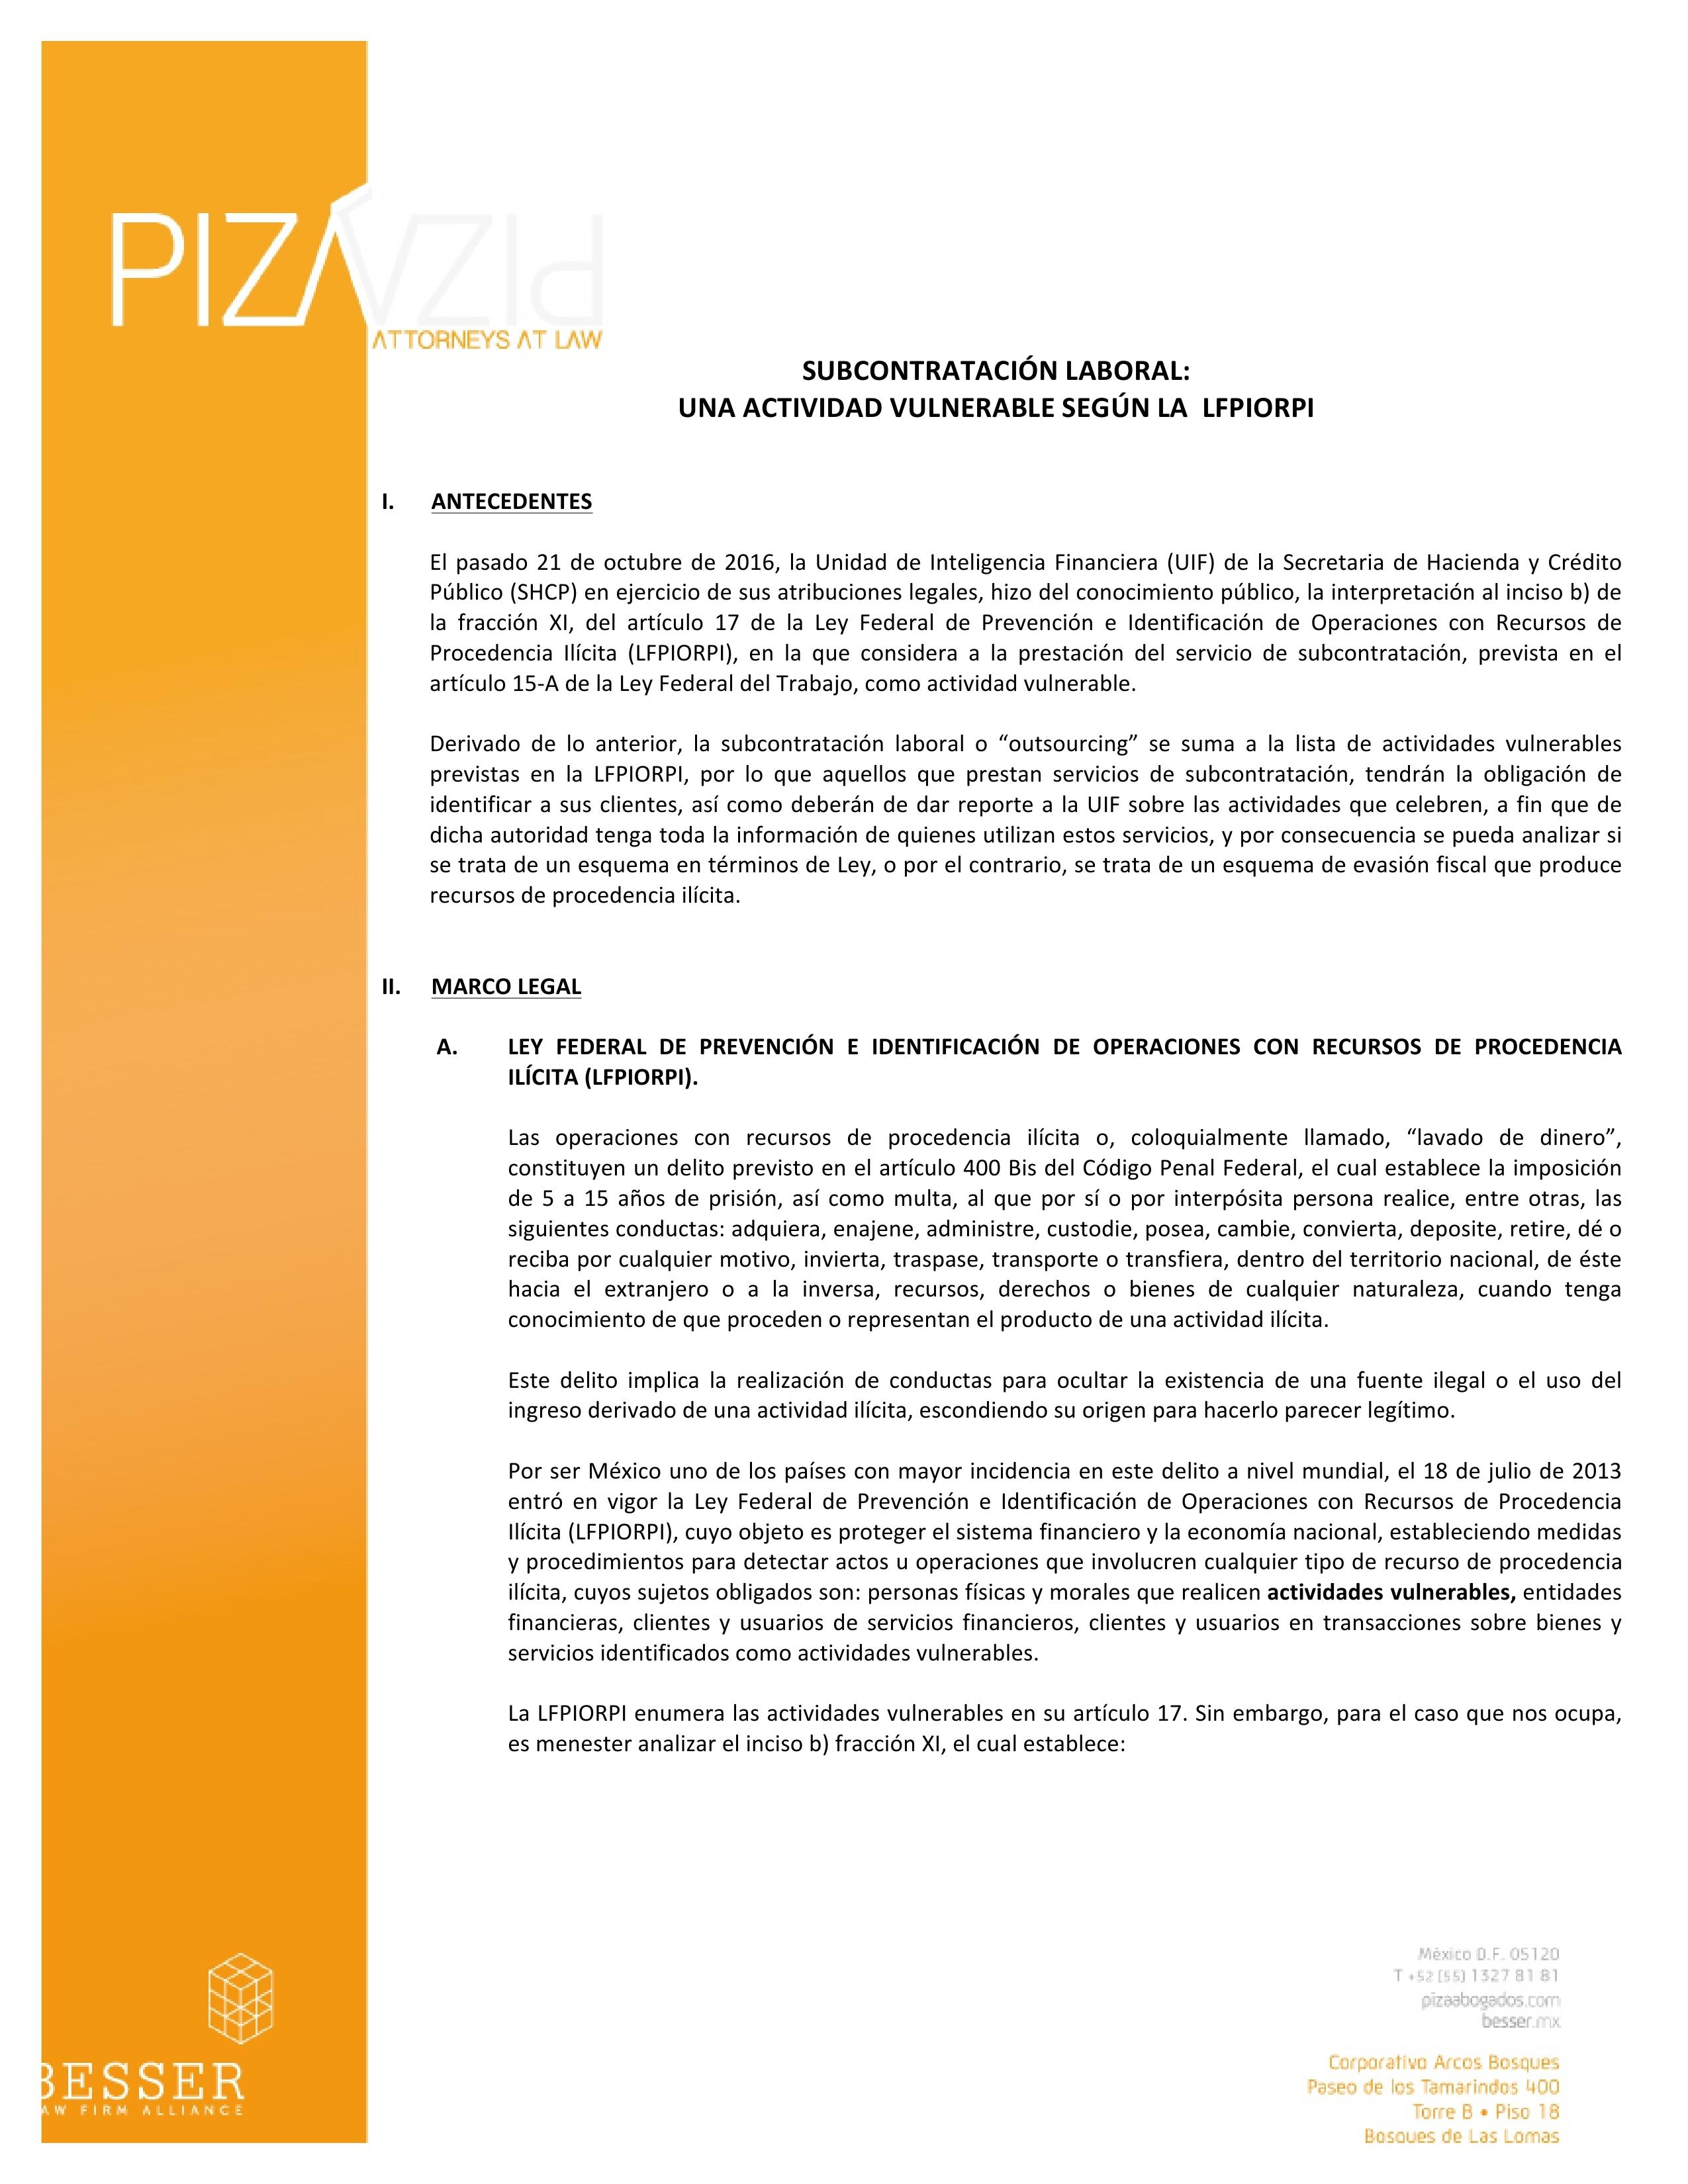 Outsourcing_como_actividad_vulnerable.pdf_page_1